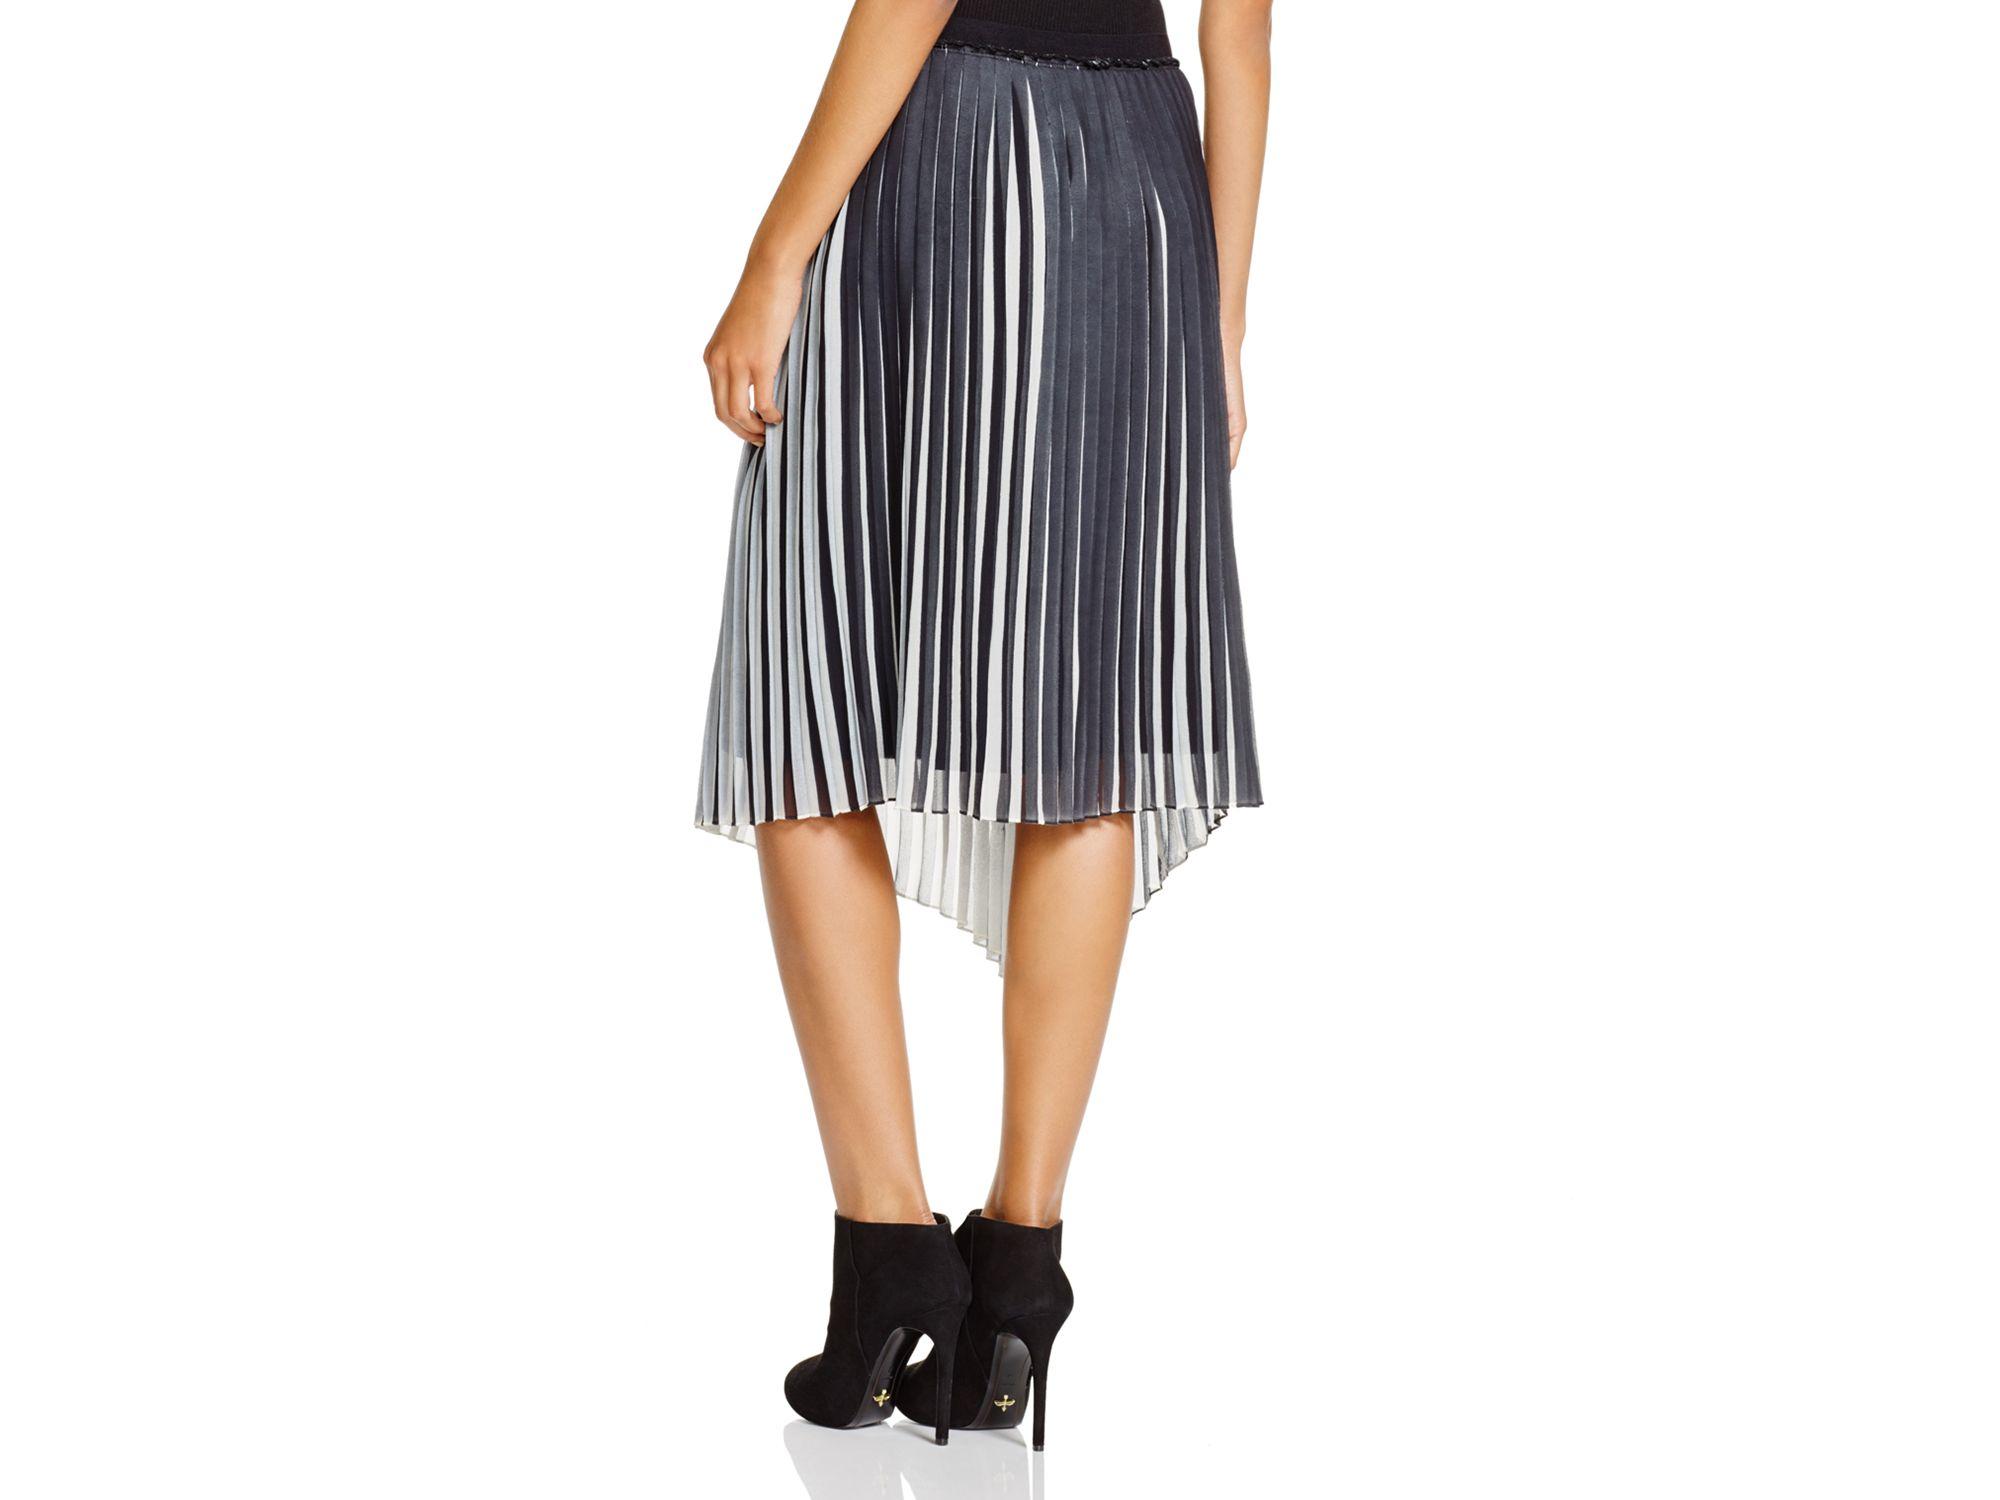 69d5c31e09 DKNY Pure Color Block Asymmetric Pleated Skirt in Black - Lyst